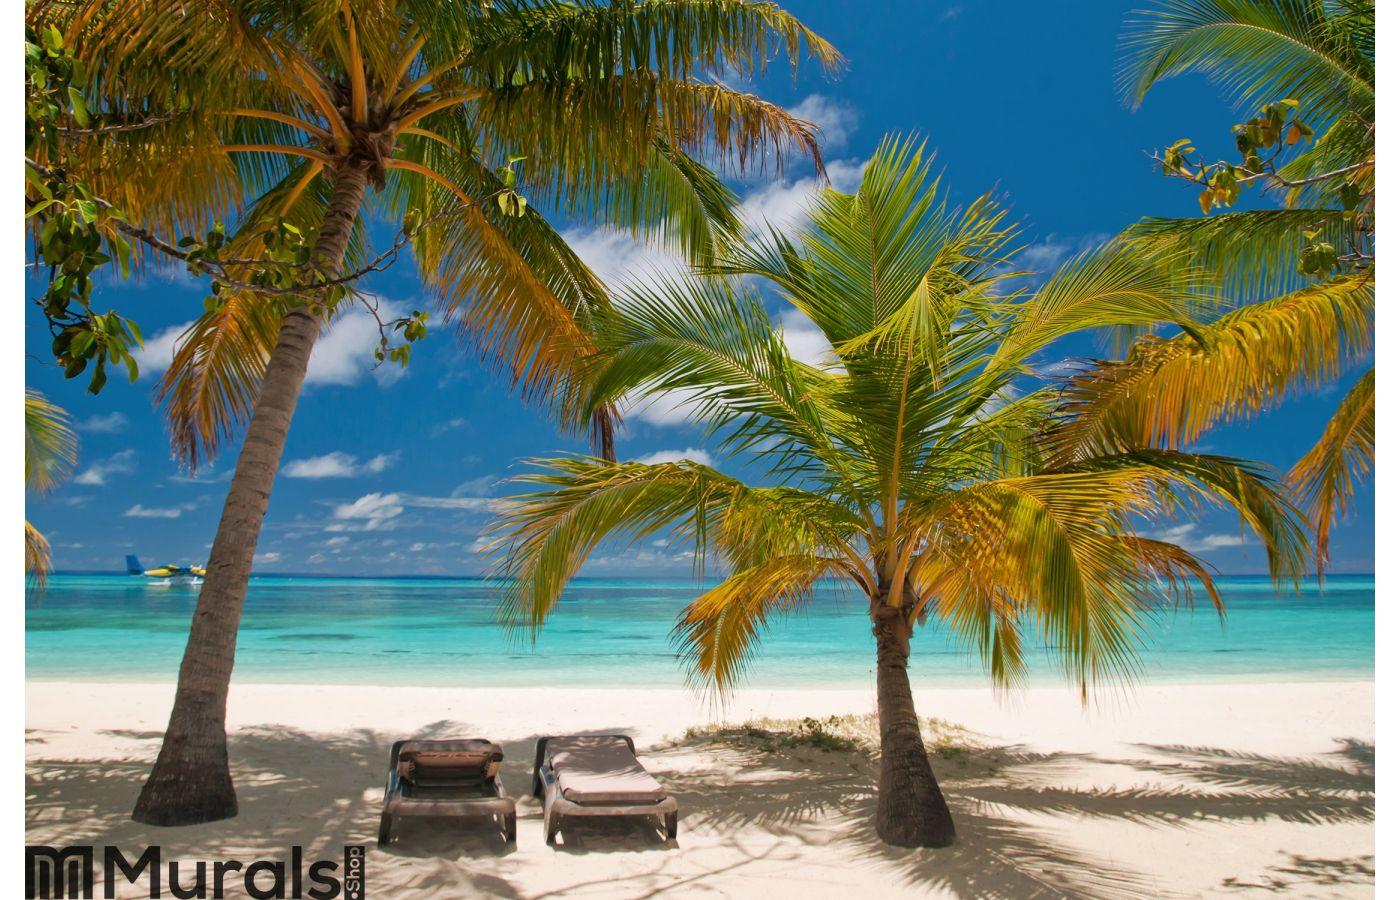 Sunbeds On A Tropical Beach Wall Mural